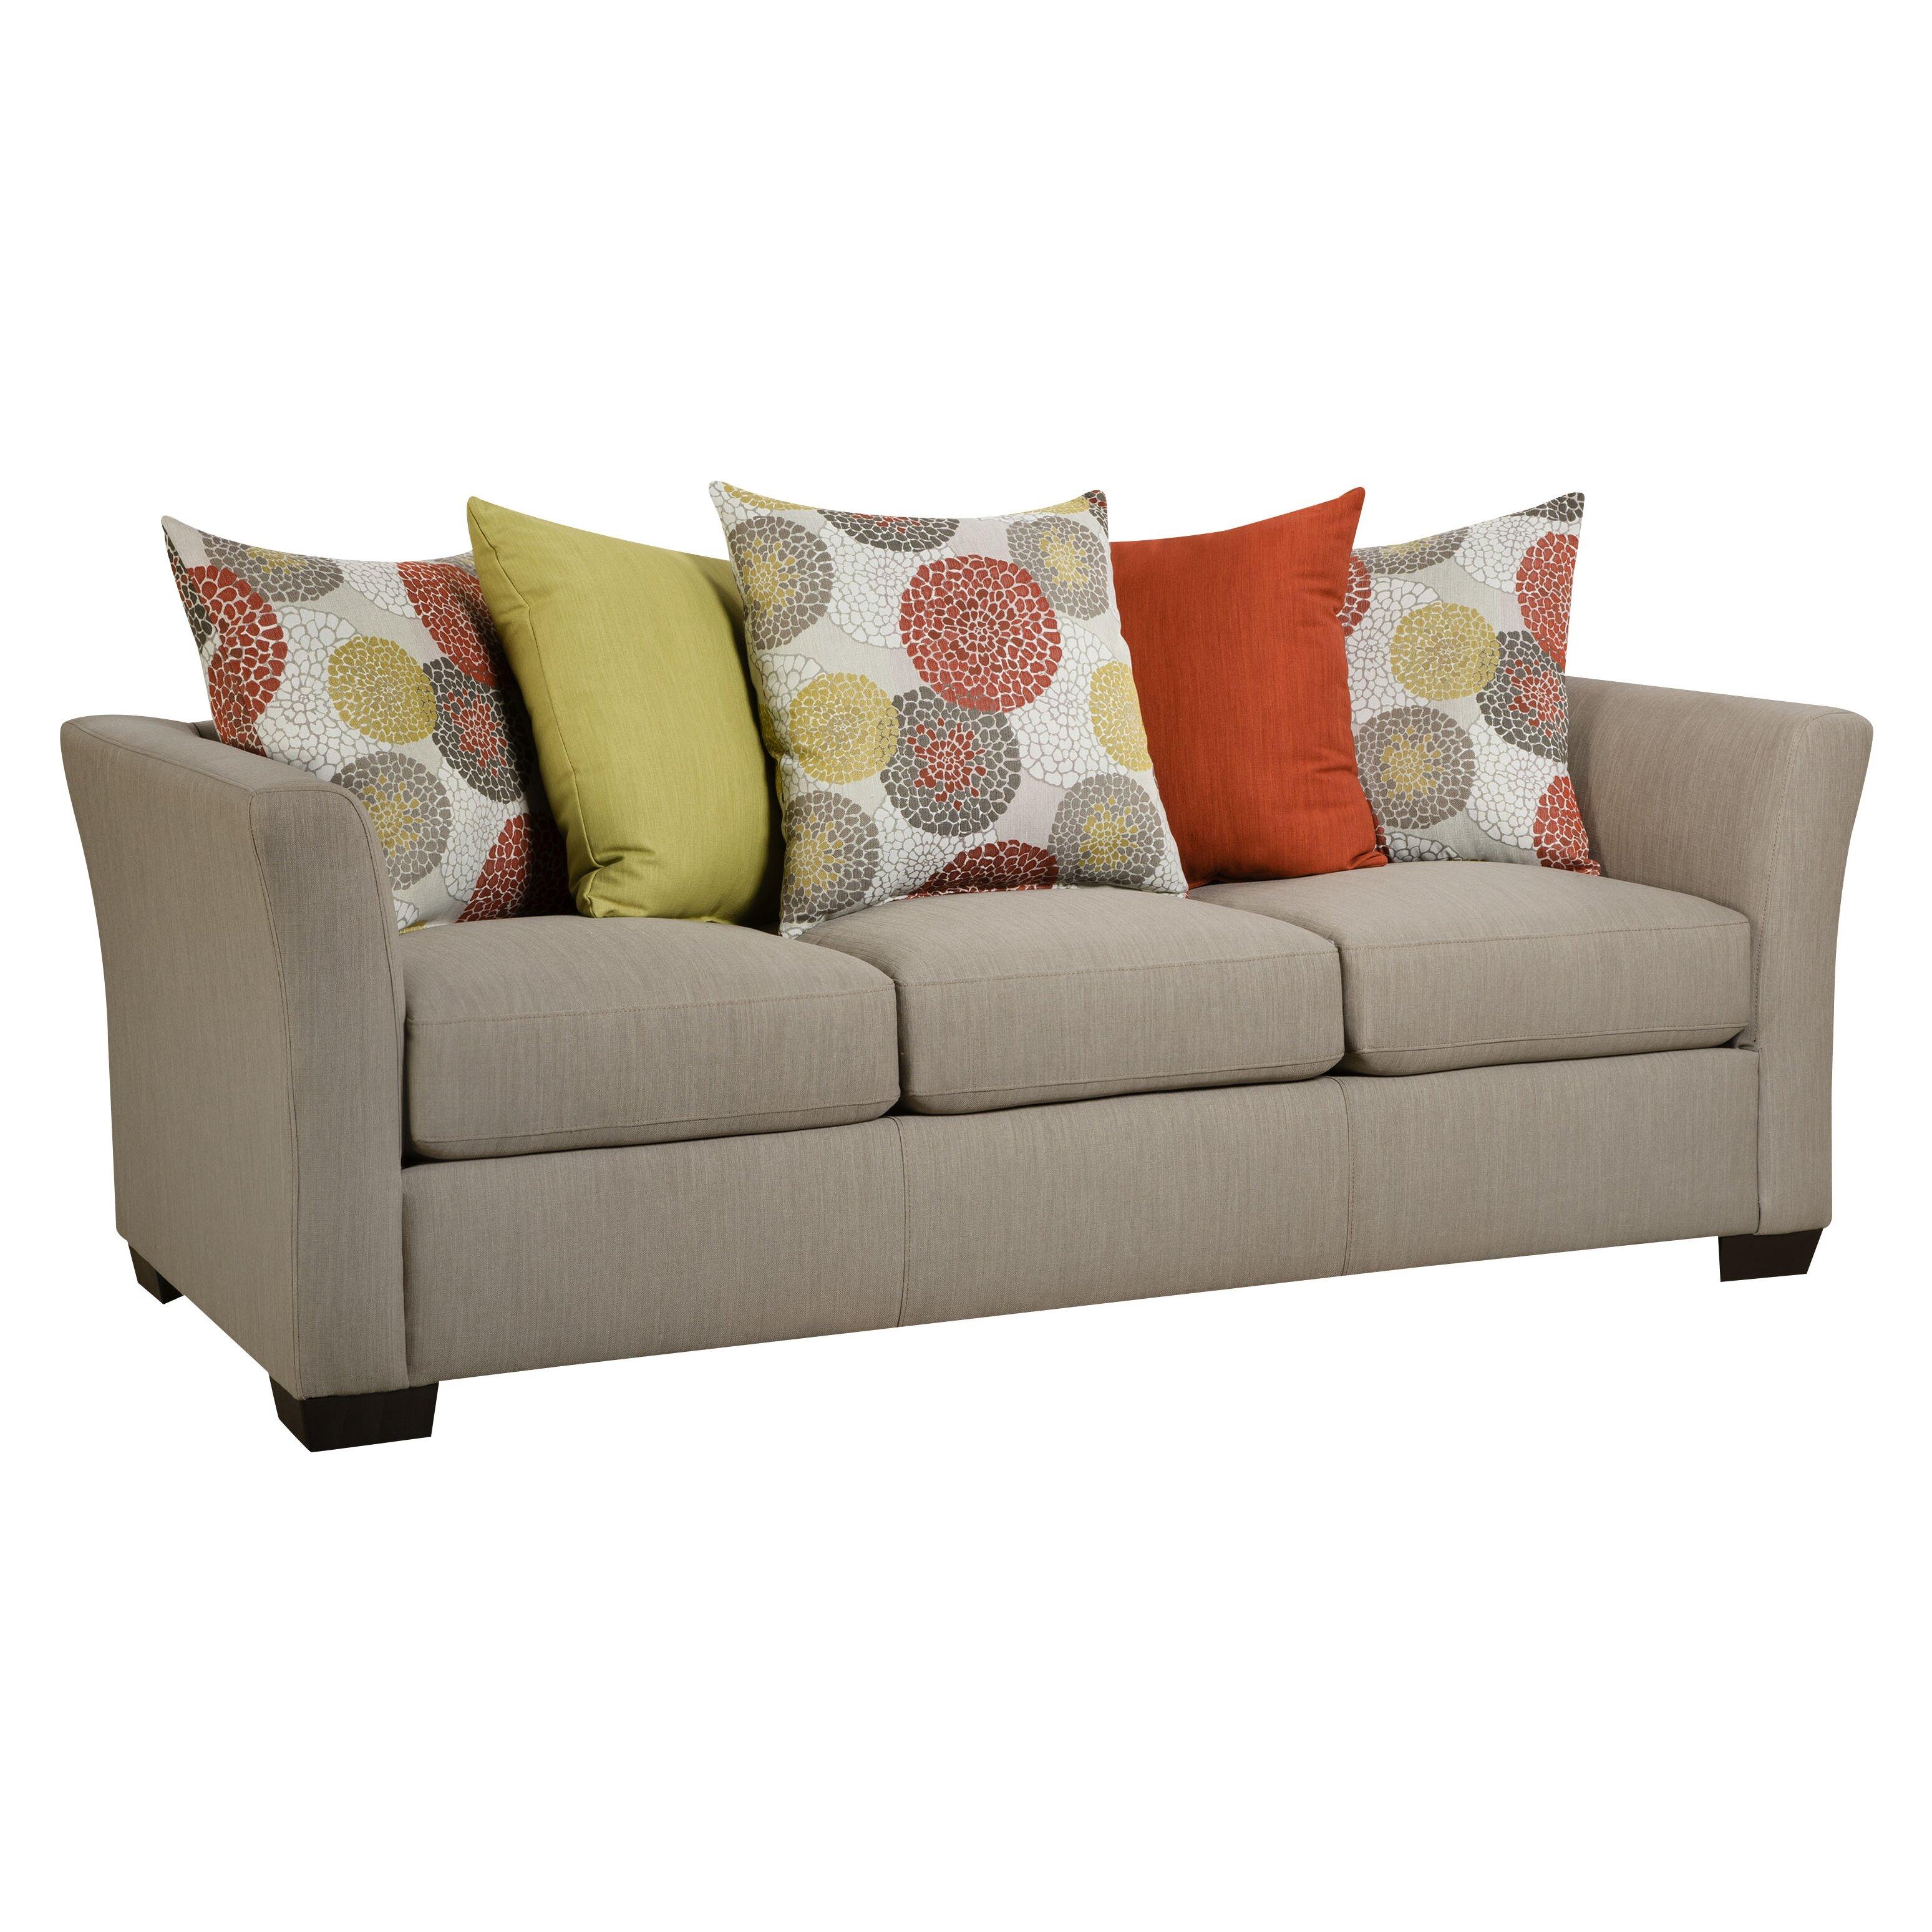 Simmons upholstery playground sleeper sofa wayfair for Simmons upholstery sectional sofa